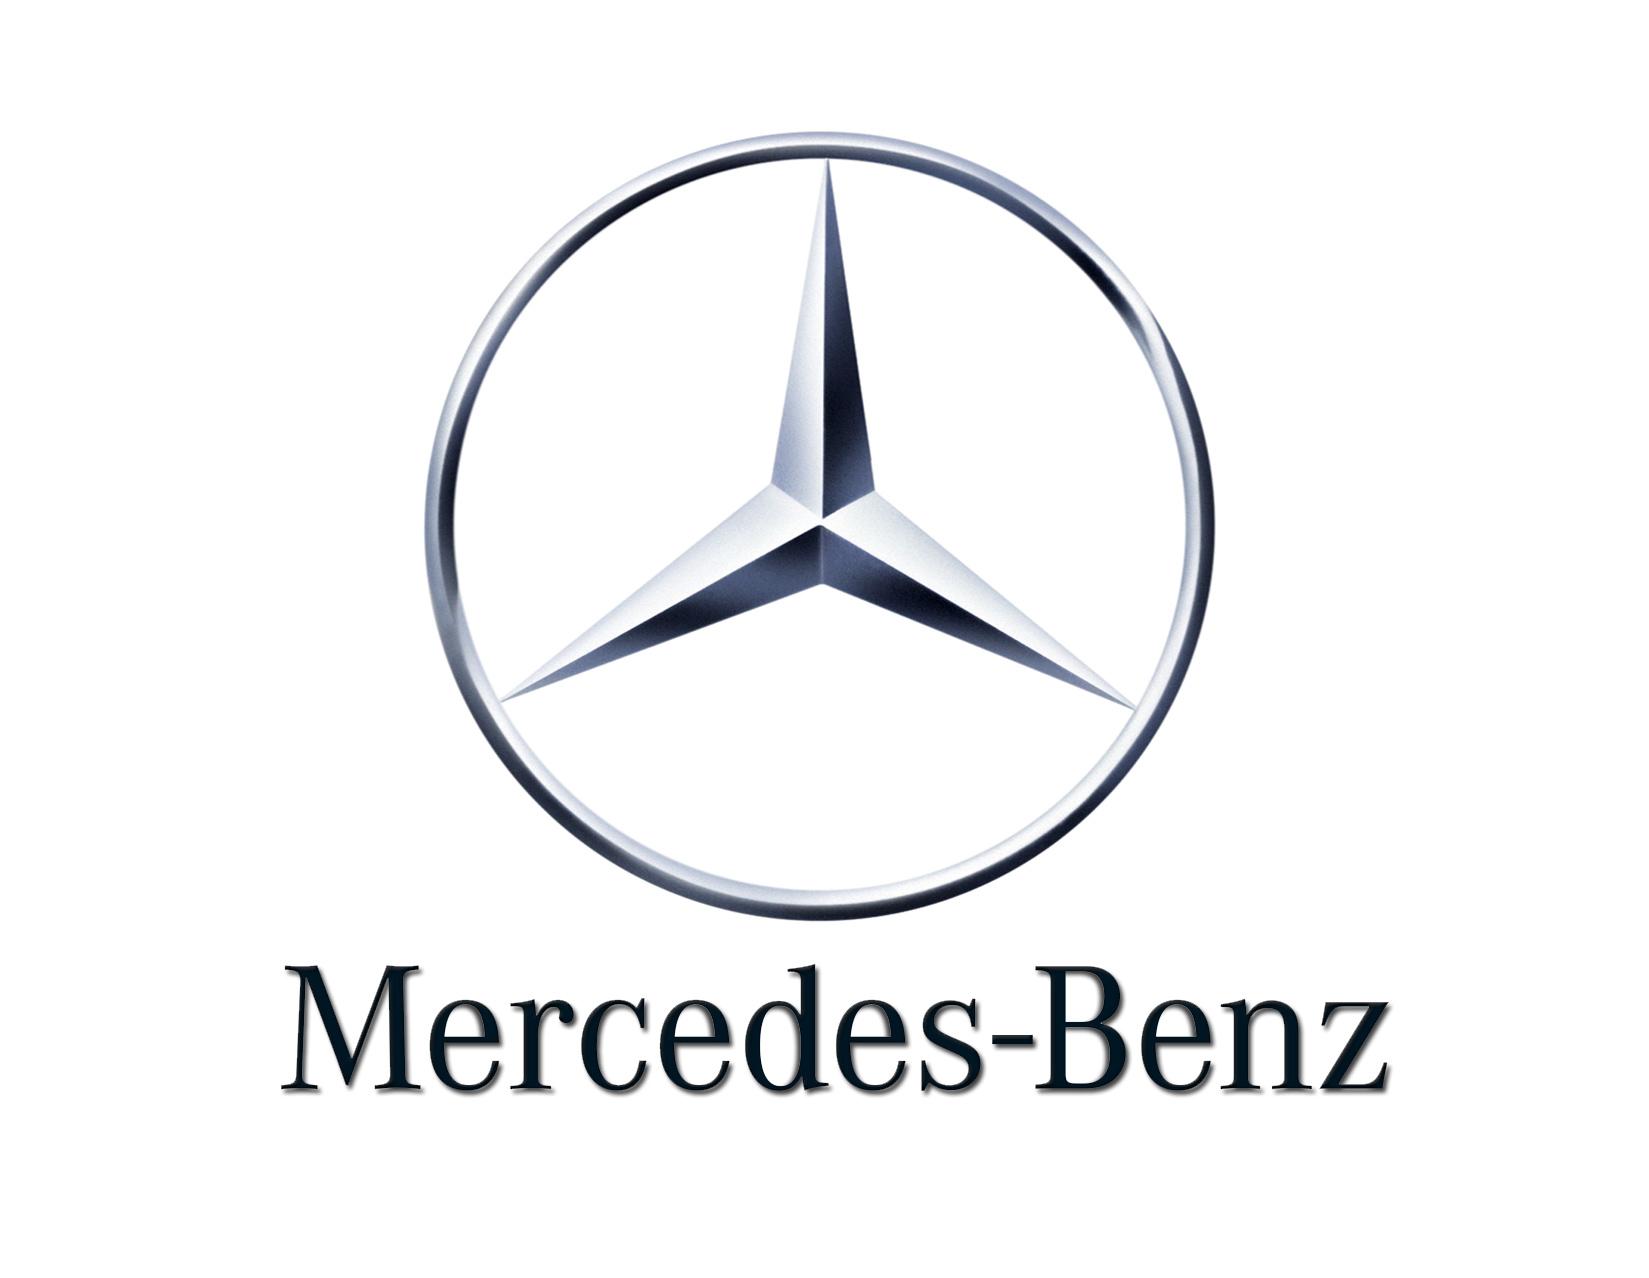 MercedesBenz - Audi - BMW